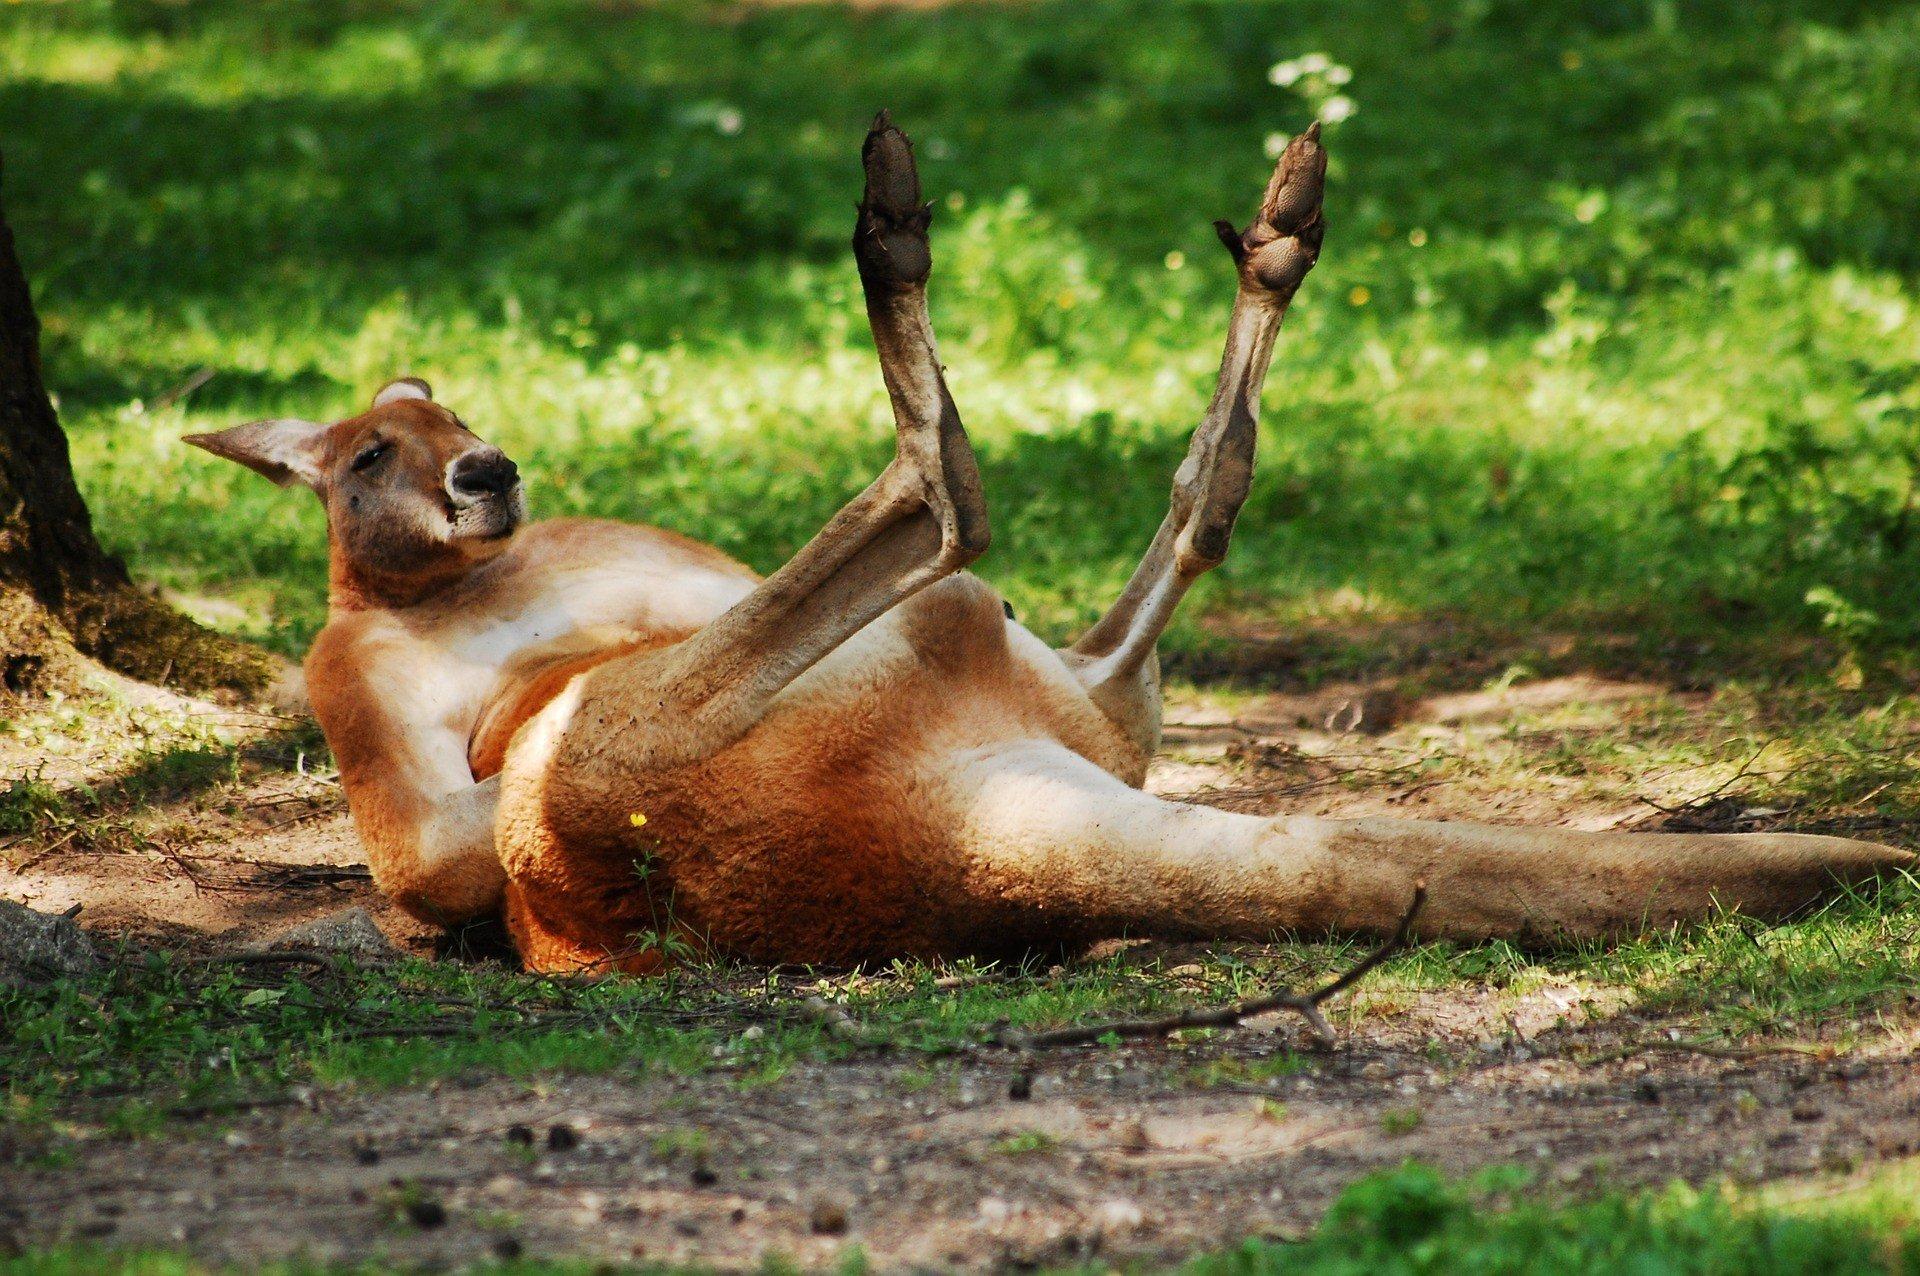 Kangaroo (source: Pixabay)